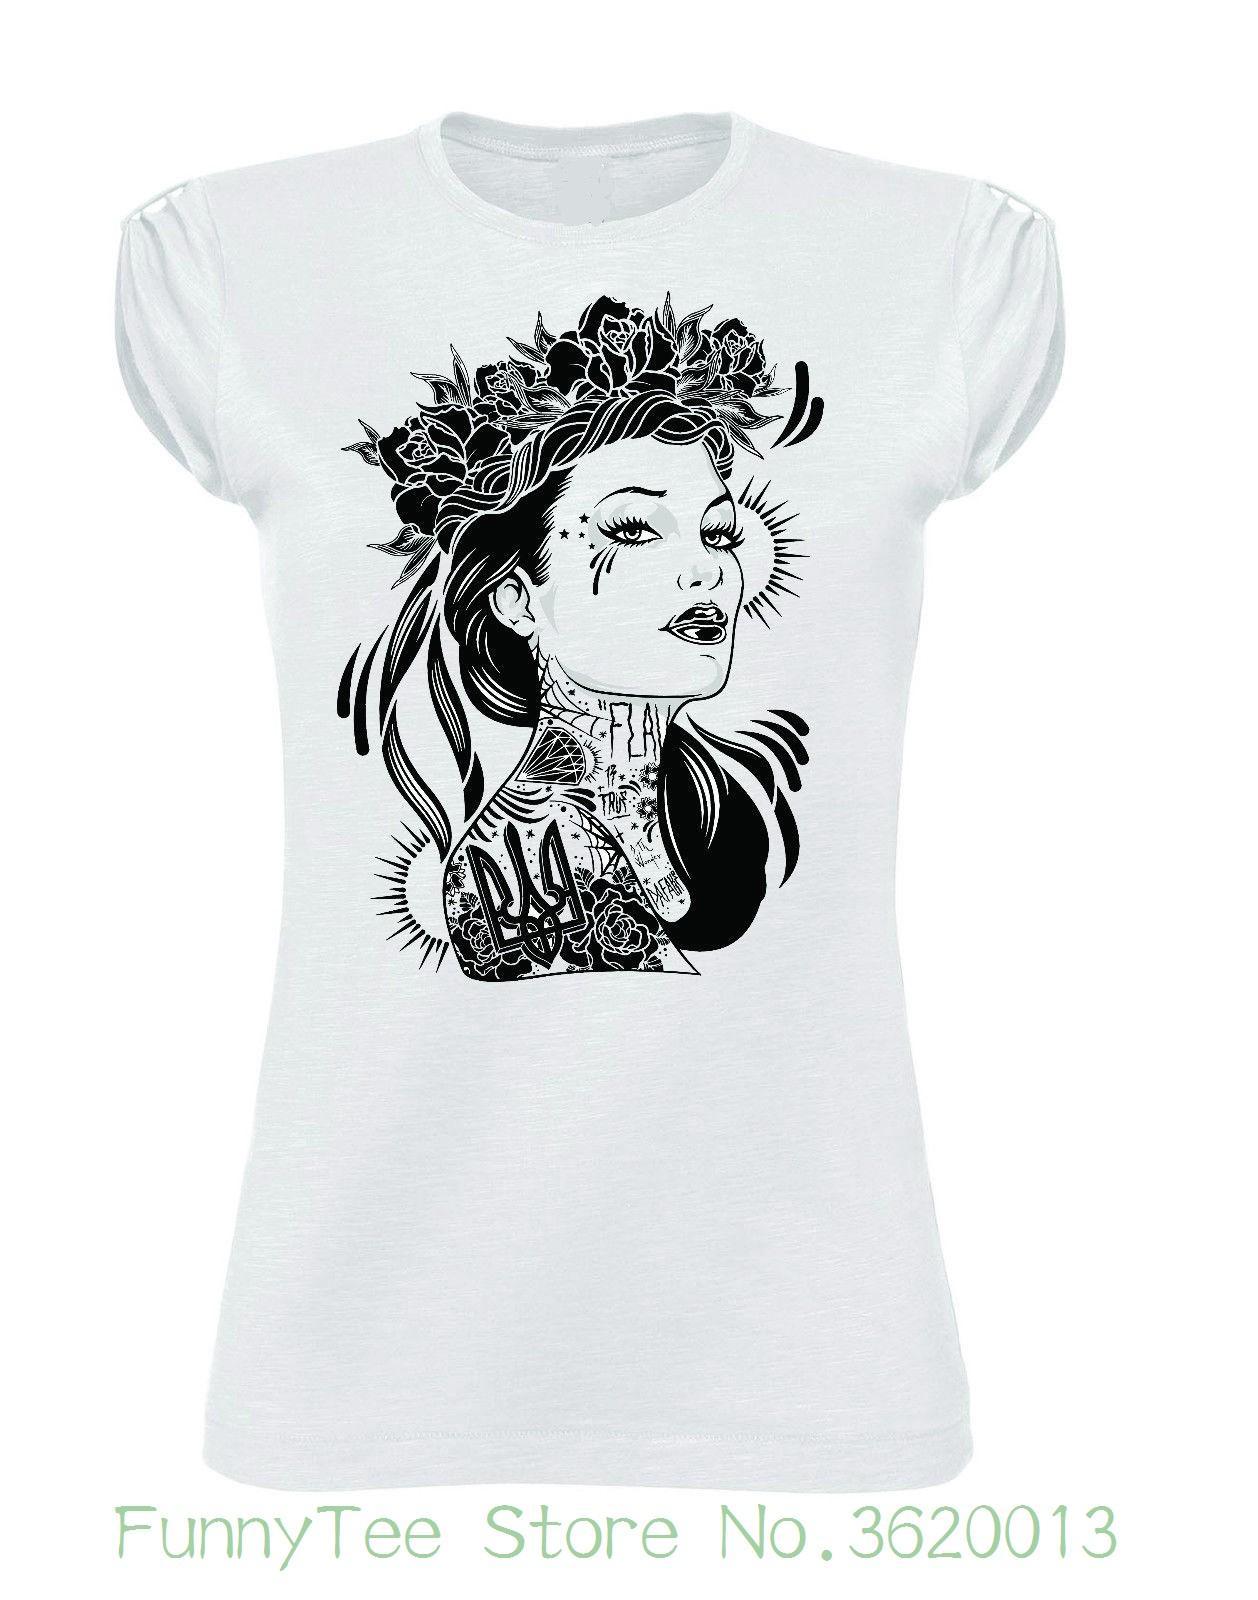 new styles 234b5 99e66 Women s Tee Tshirt Donna Girl Tattoo Rose Moda Fashion No Happiness 8th  Wonder Printed Funny T shirt Hip Hop Cotton